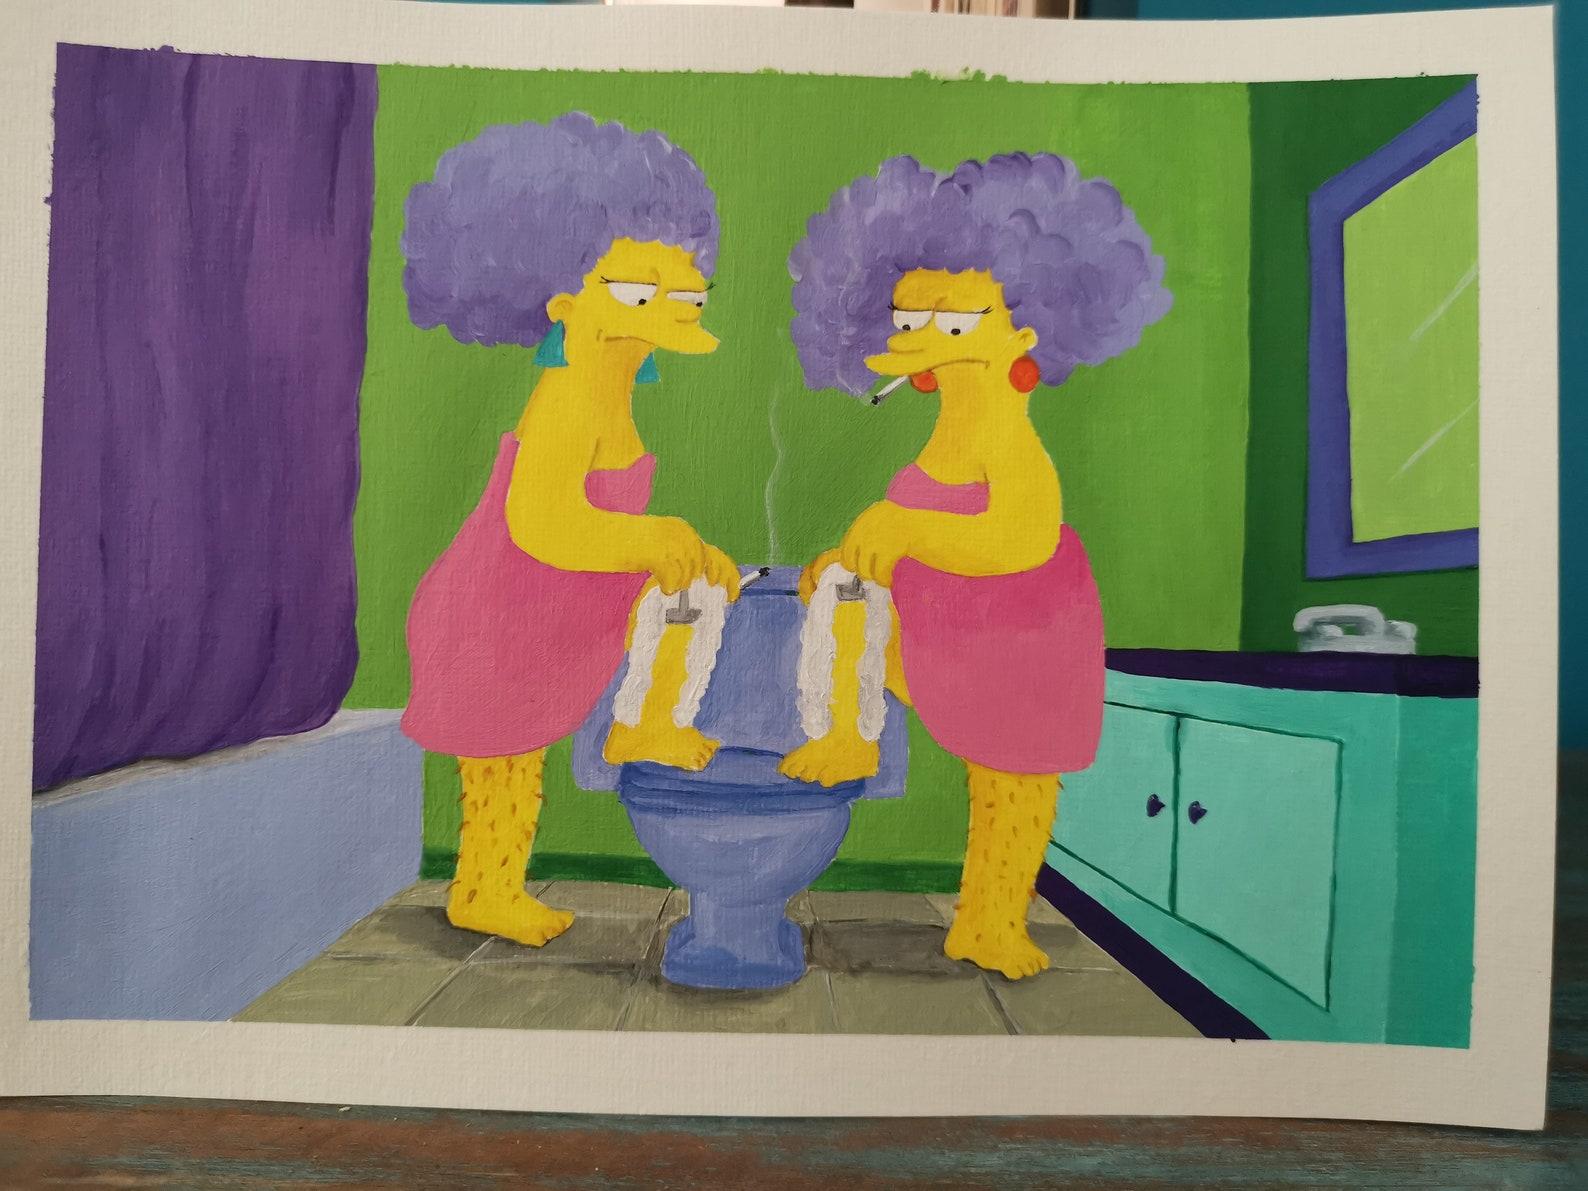 Patty und Selma Rasieren handbemalte Szene die Simpsons | Etsy